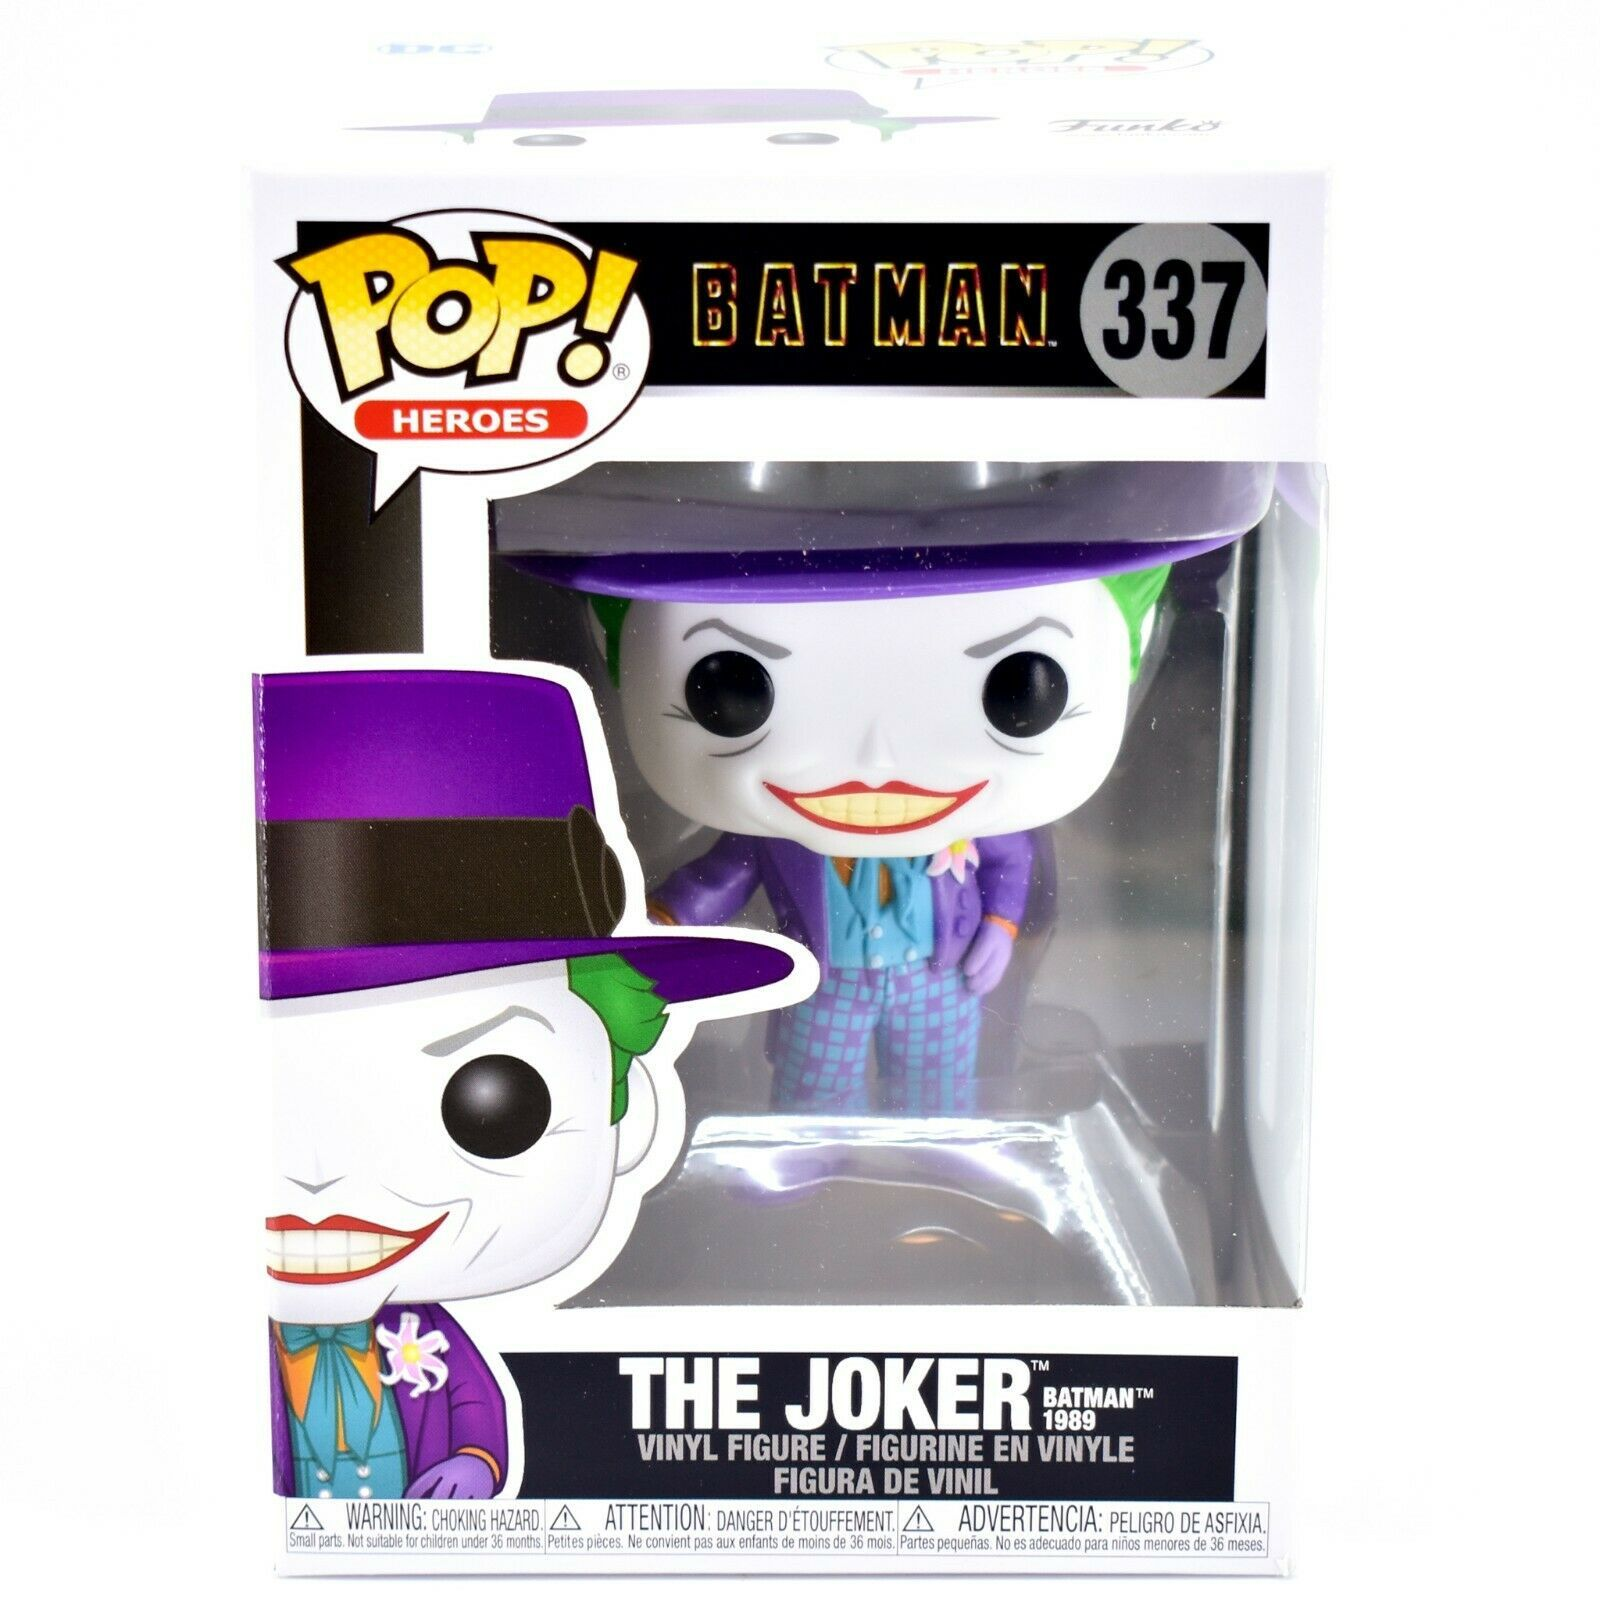 Funko Pop! Heroes Batman The Joker 1989 #337 Vinyl Figure